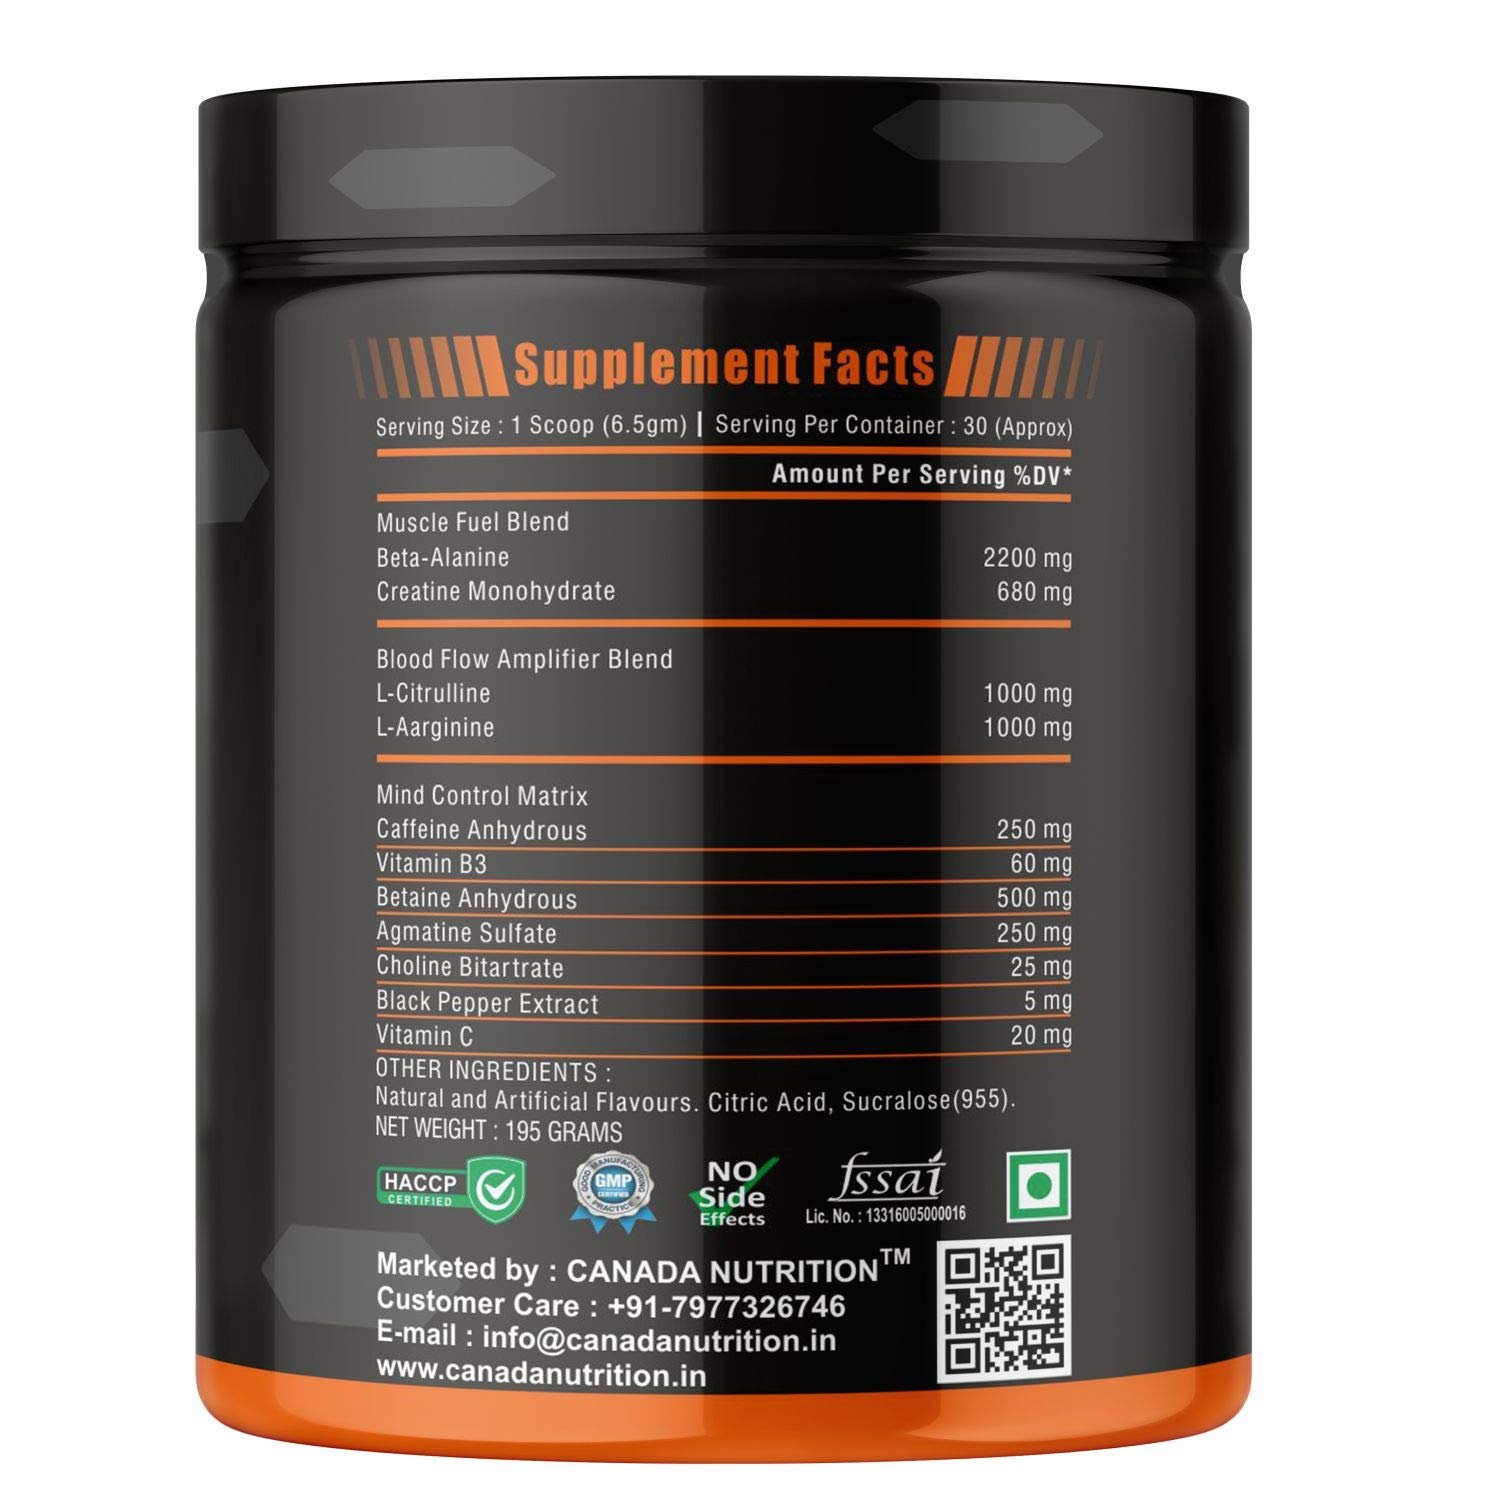 Allnutrition Pre-Workout 120g 4serv Focus Energy Endurance Citrulline B.alanine